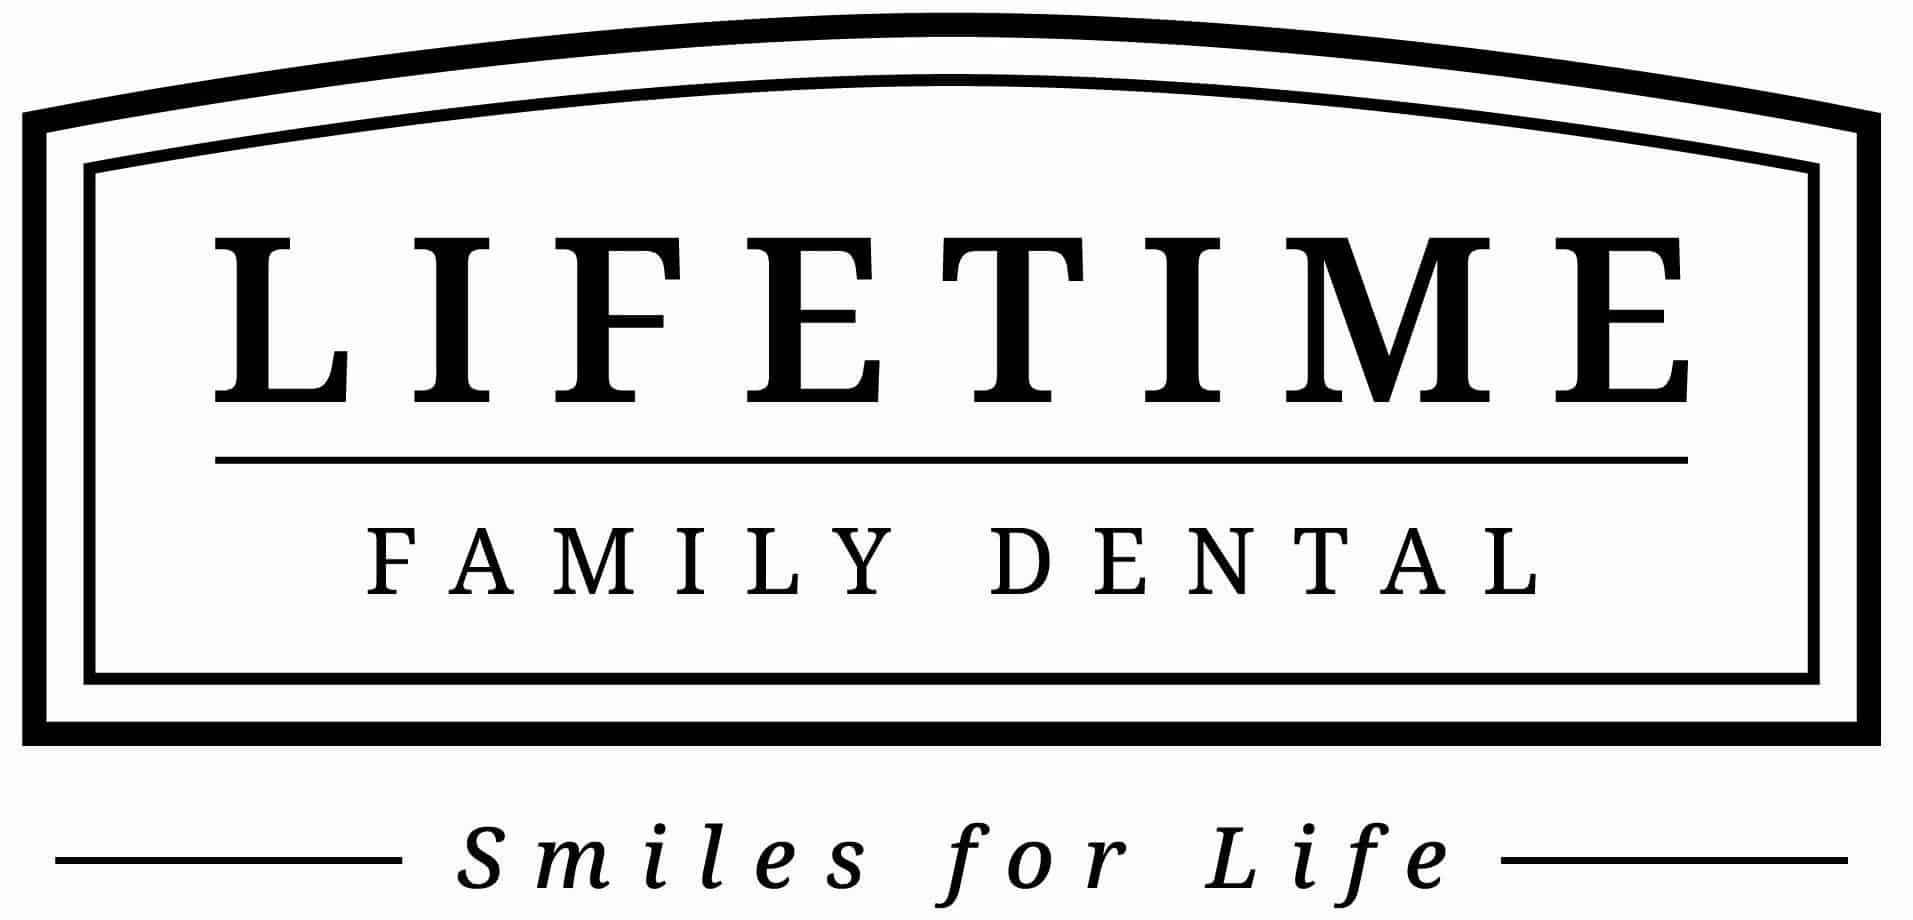 Lifetime Family Dental - Kaysville Dentist is Providing Quality Services In Kaysville, Utah